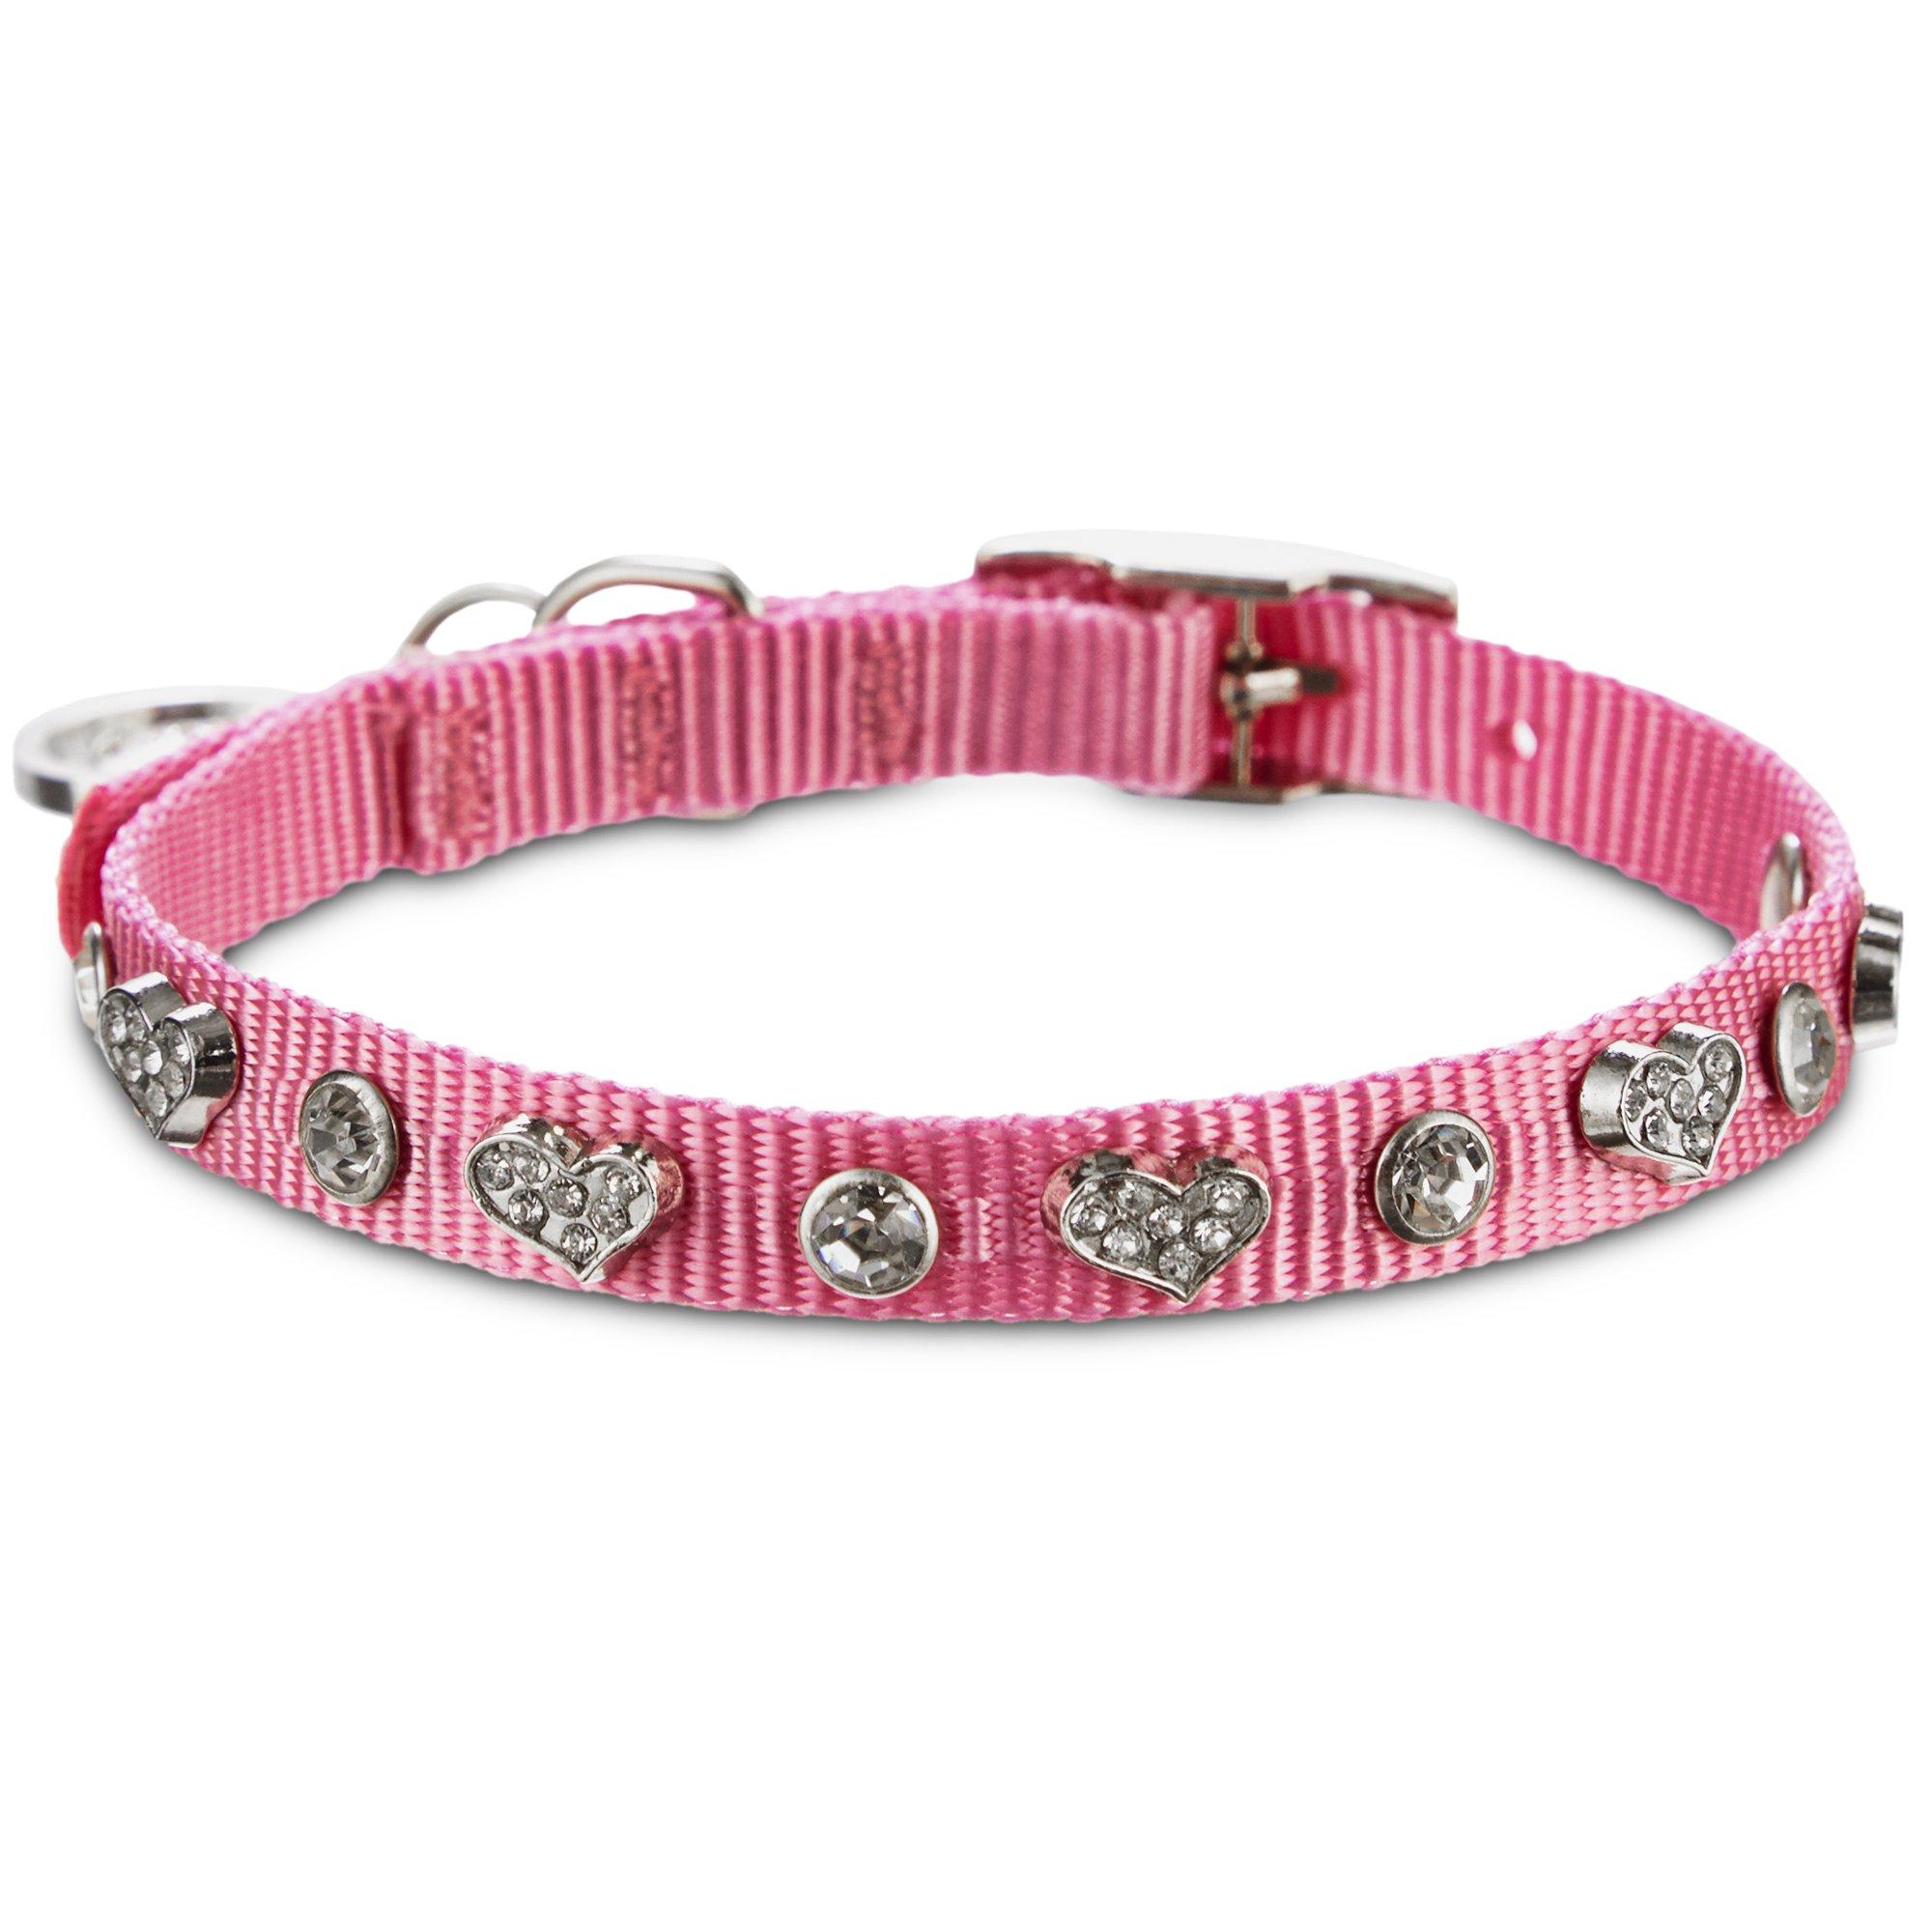 Bond & Co. Pink Heart Bling Collar